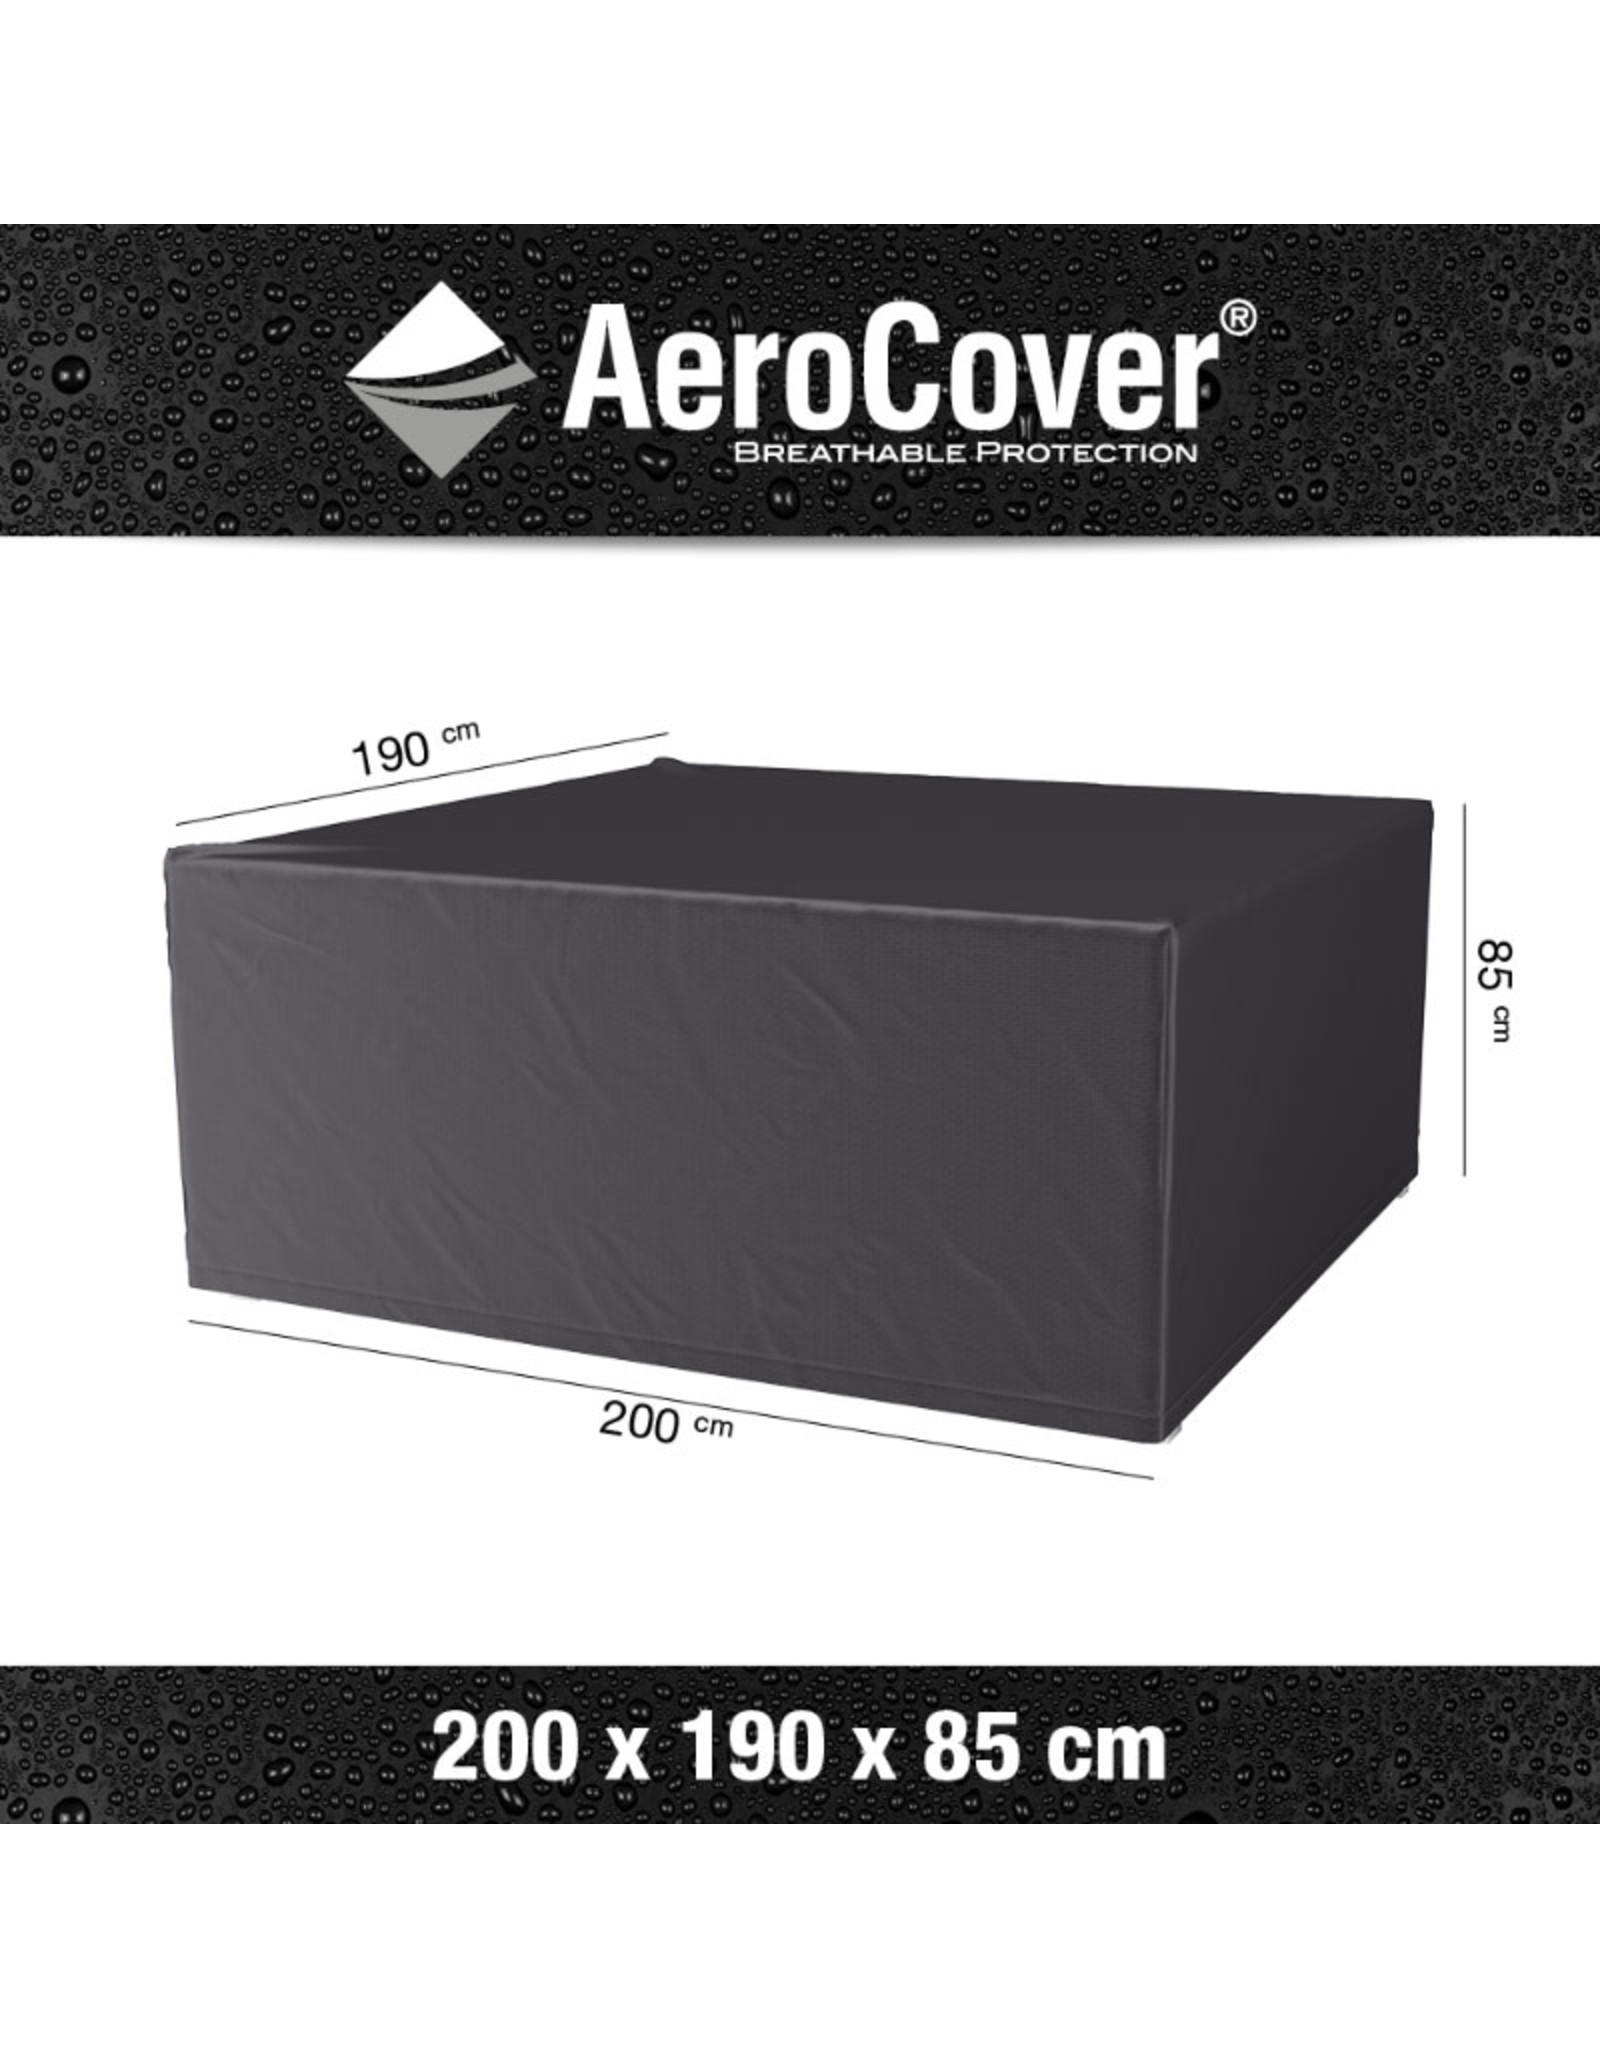 Aerocover AeroCover Tuinsethoes 200x190xH85